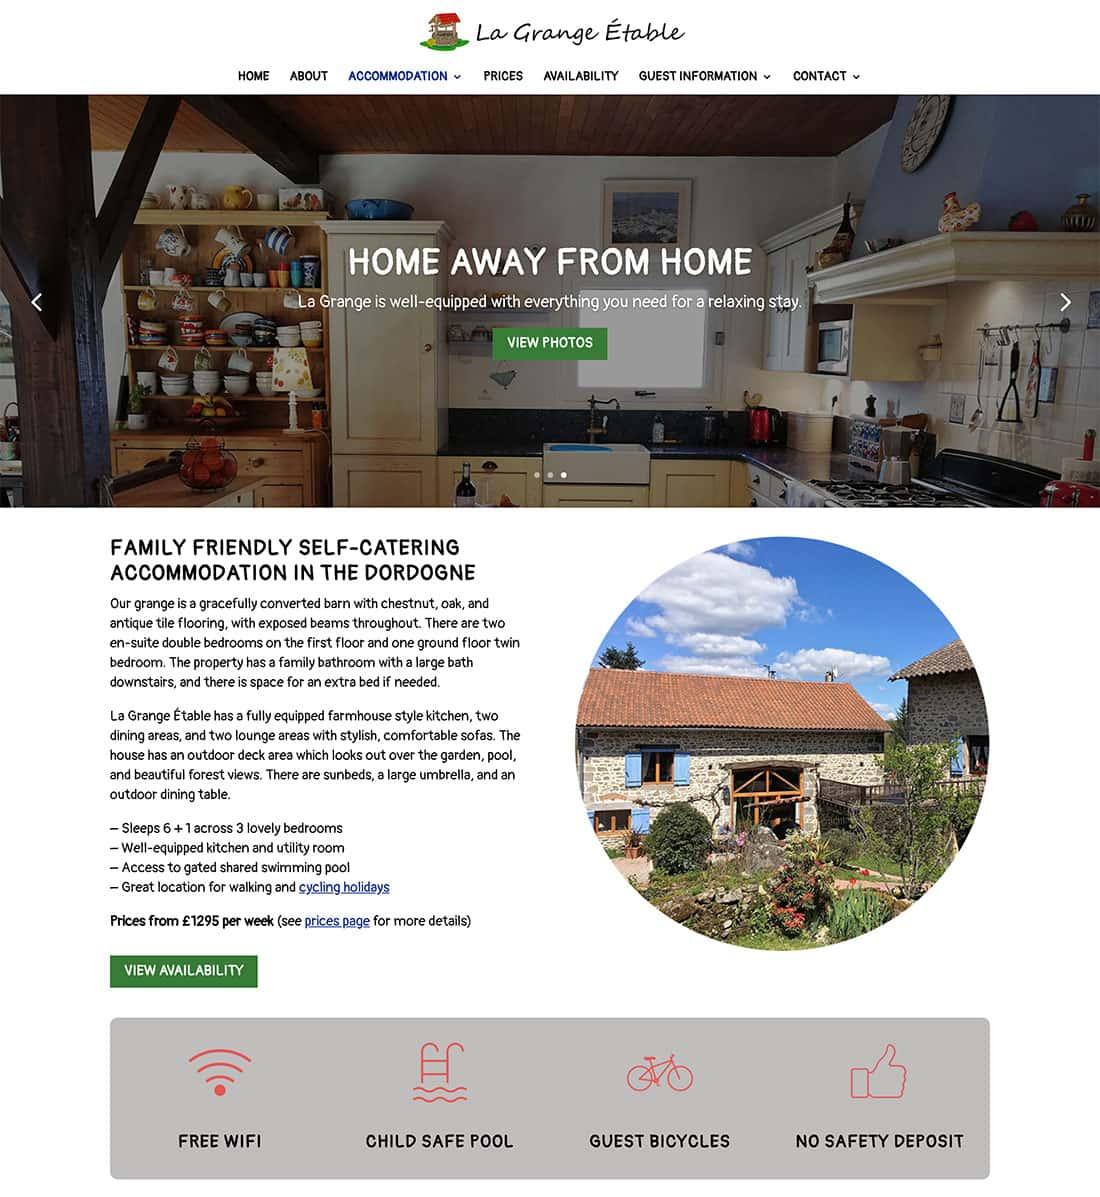 NEW Design - La Grange Etable Farmhouse Accommodation Page